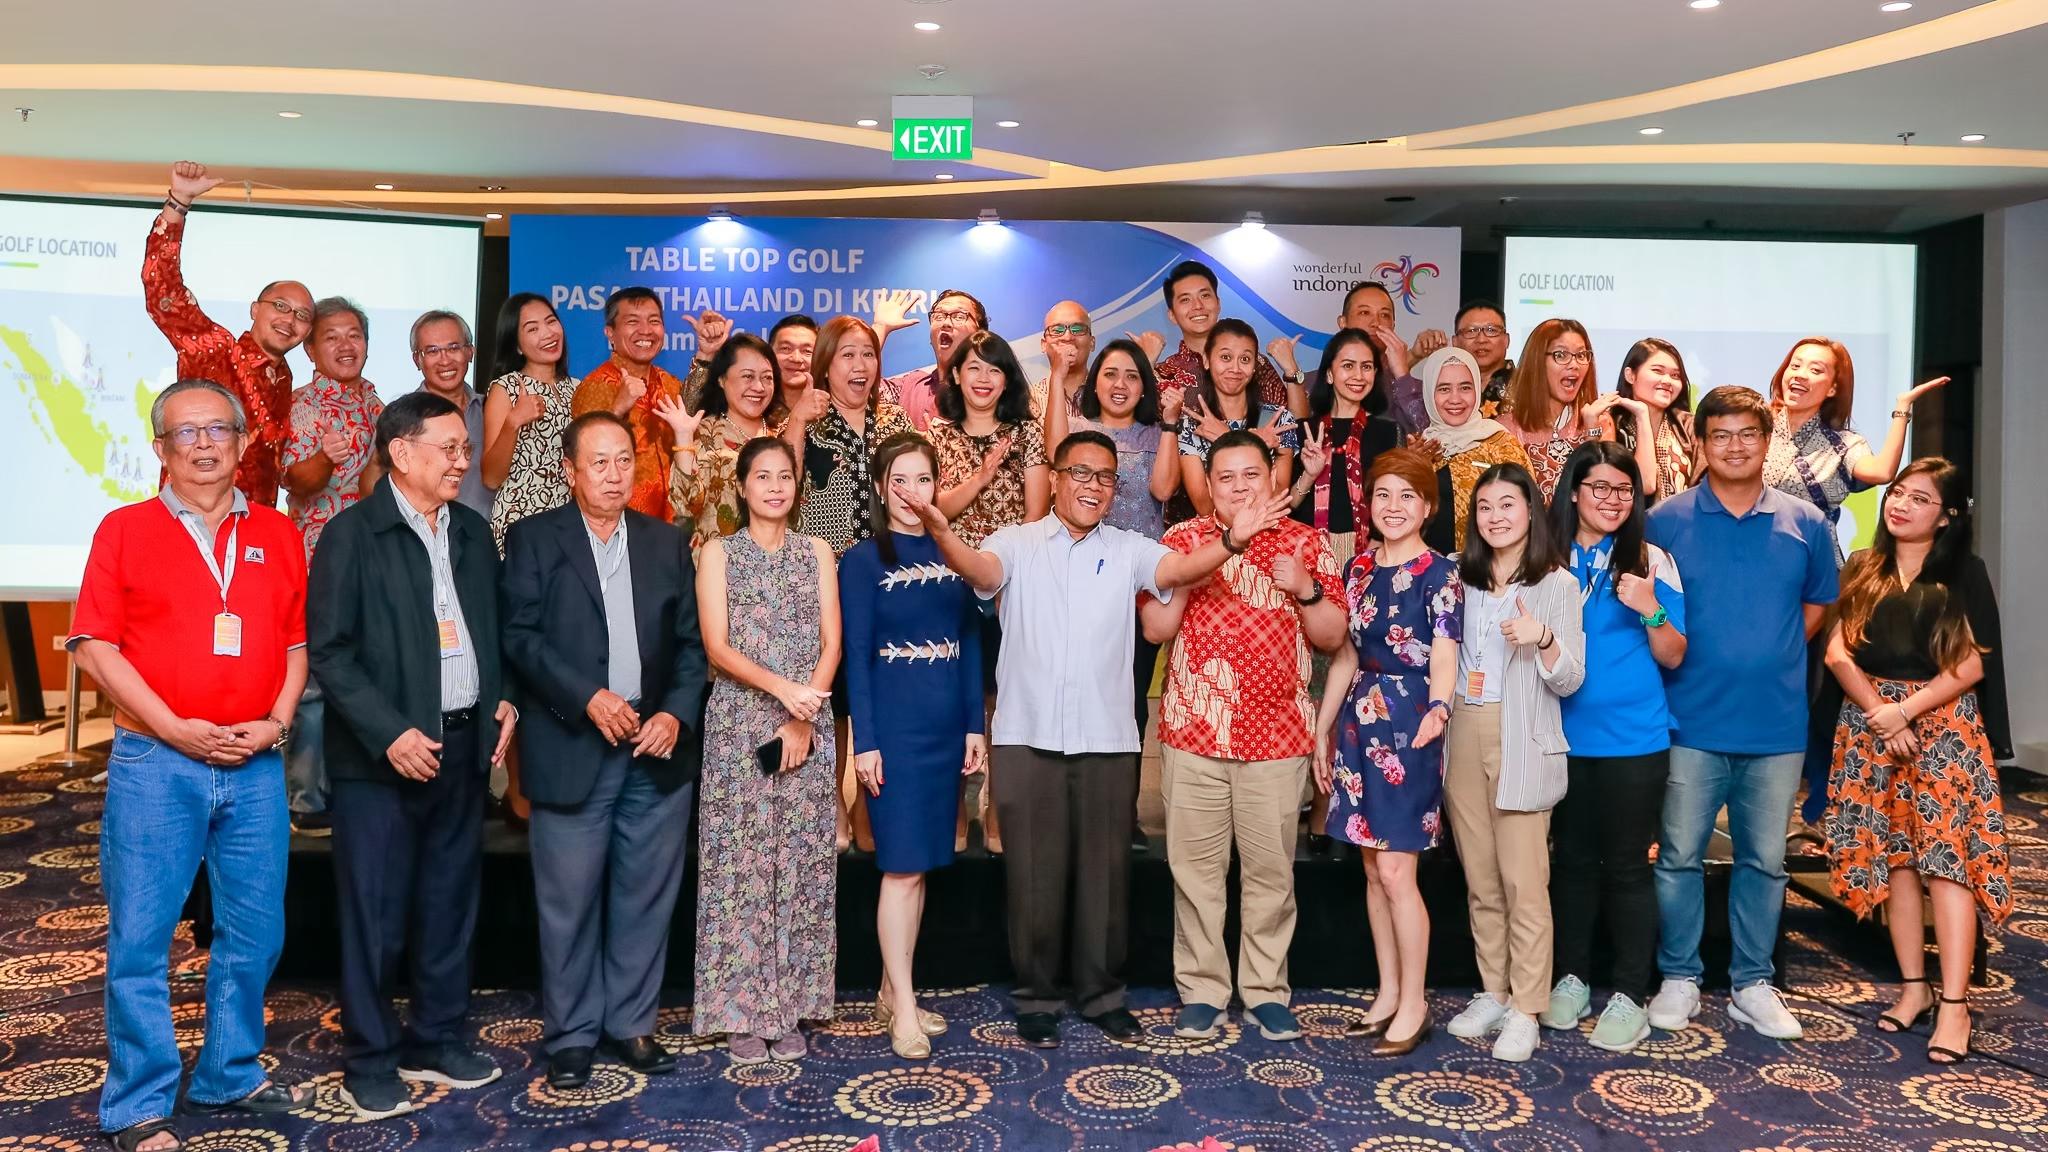 FAMILIARIZATION TRIP GOLF FOR THAILAND MARKET